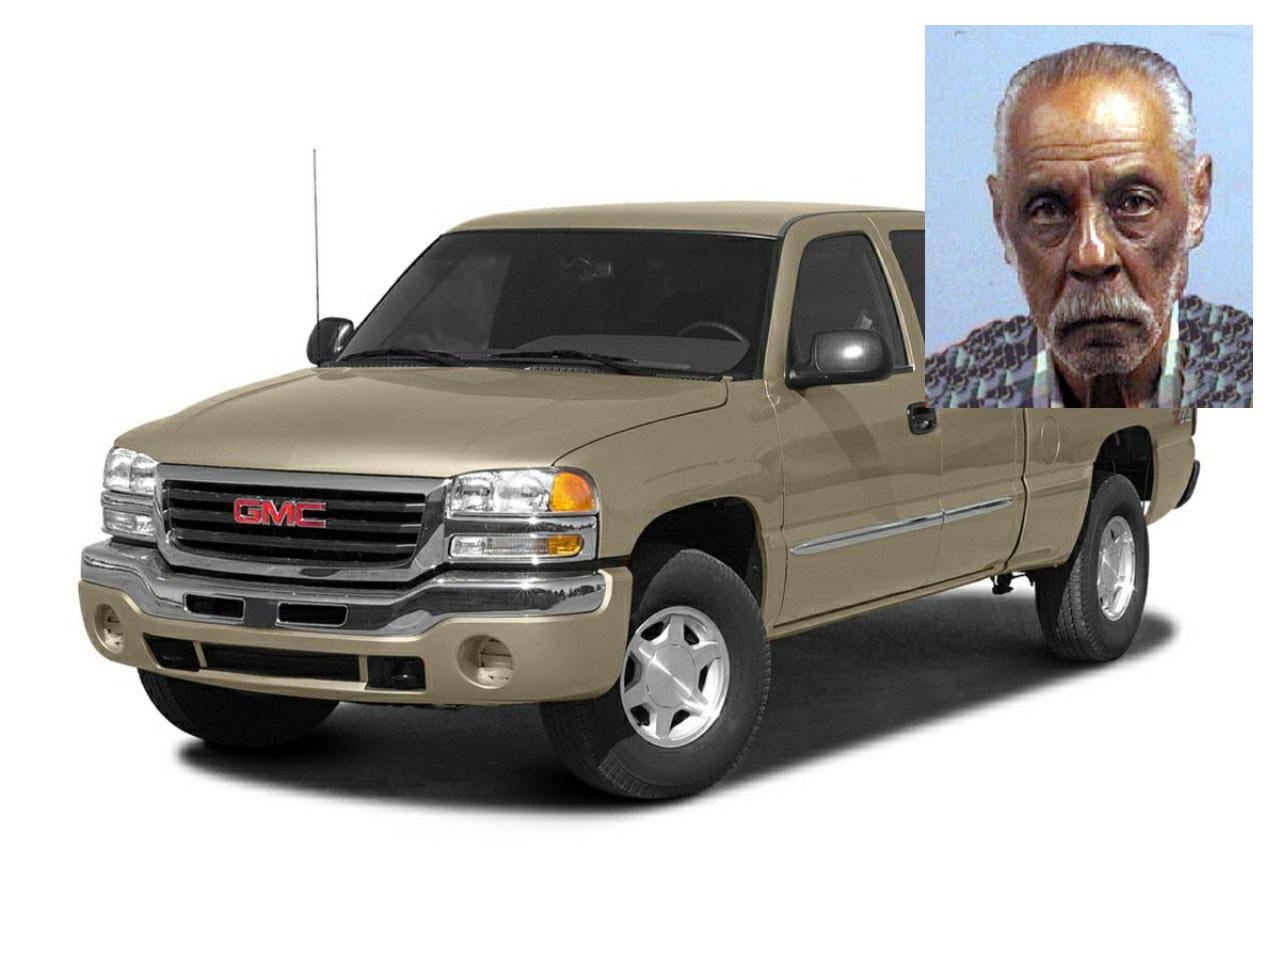 perkins-truck_1558041455012.jpg